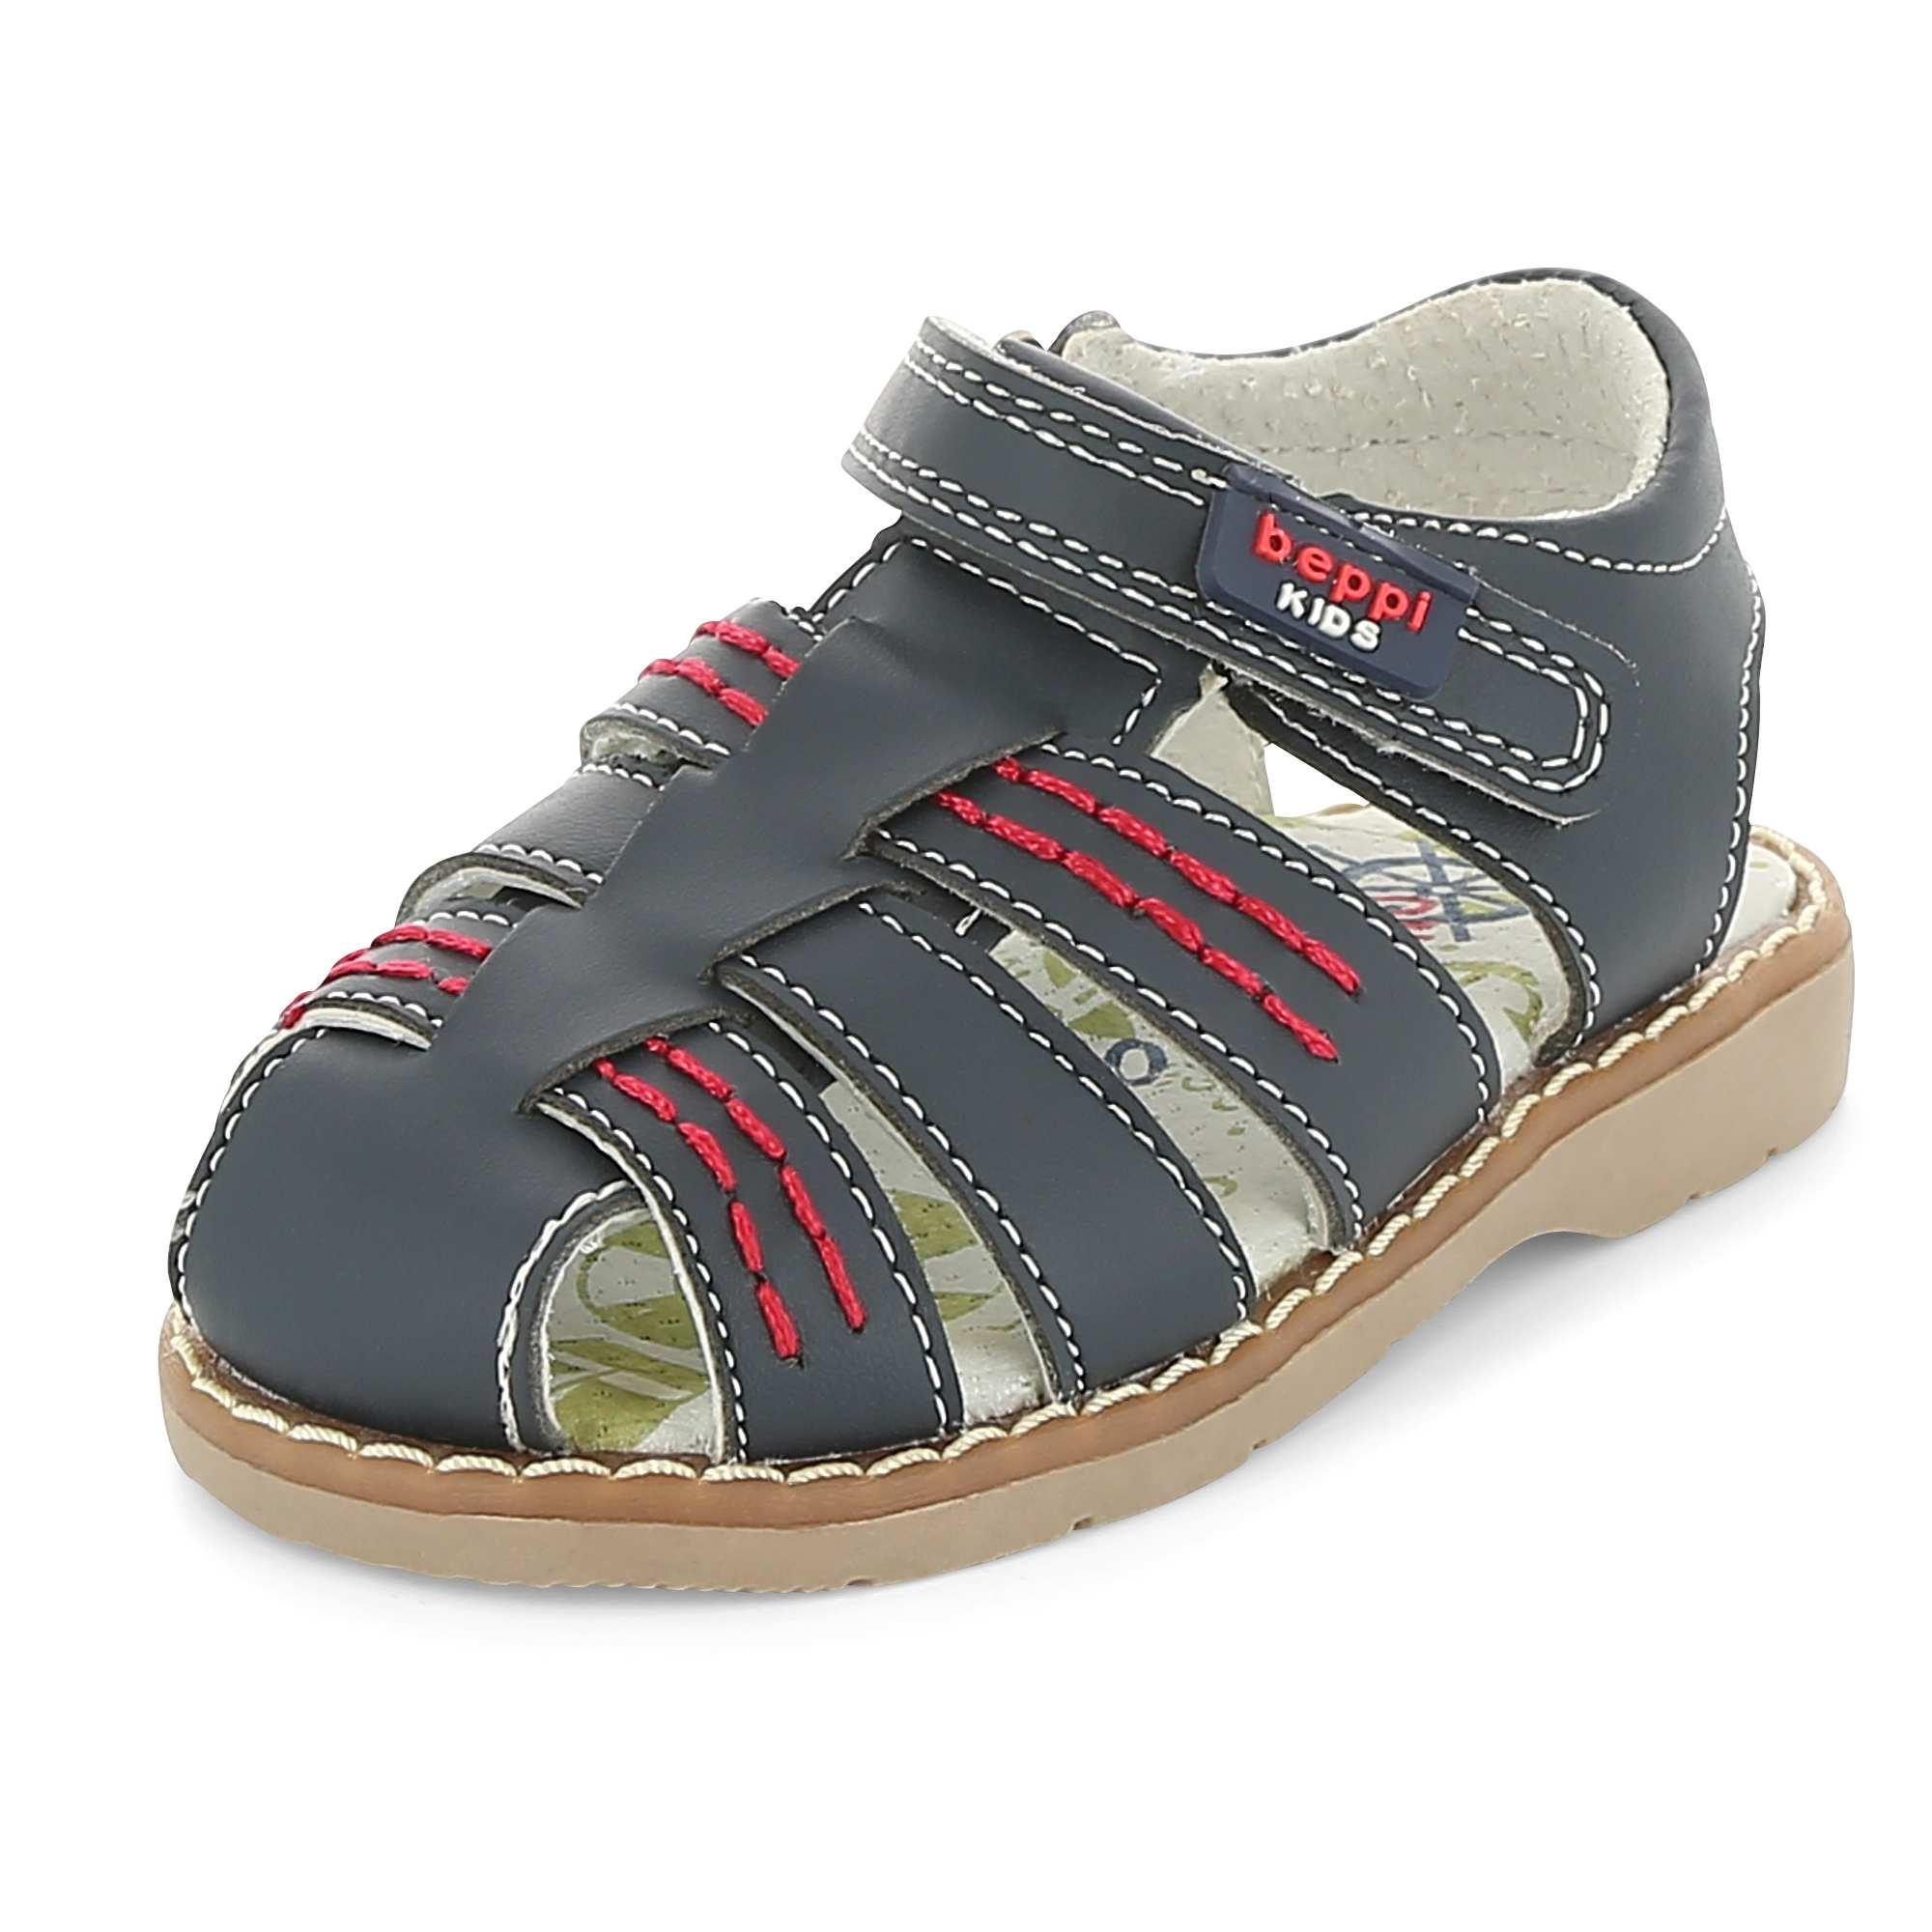 sandales en cuir gar on bleu kiabi 18 00. Black Bedroom Furniture Sets. Home Design Ideas